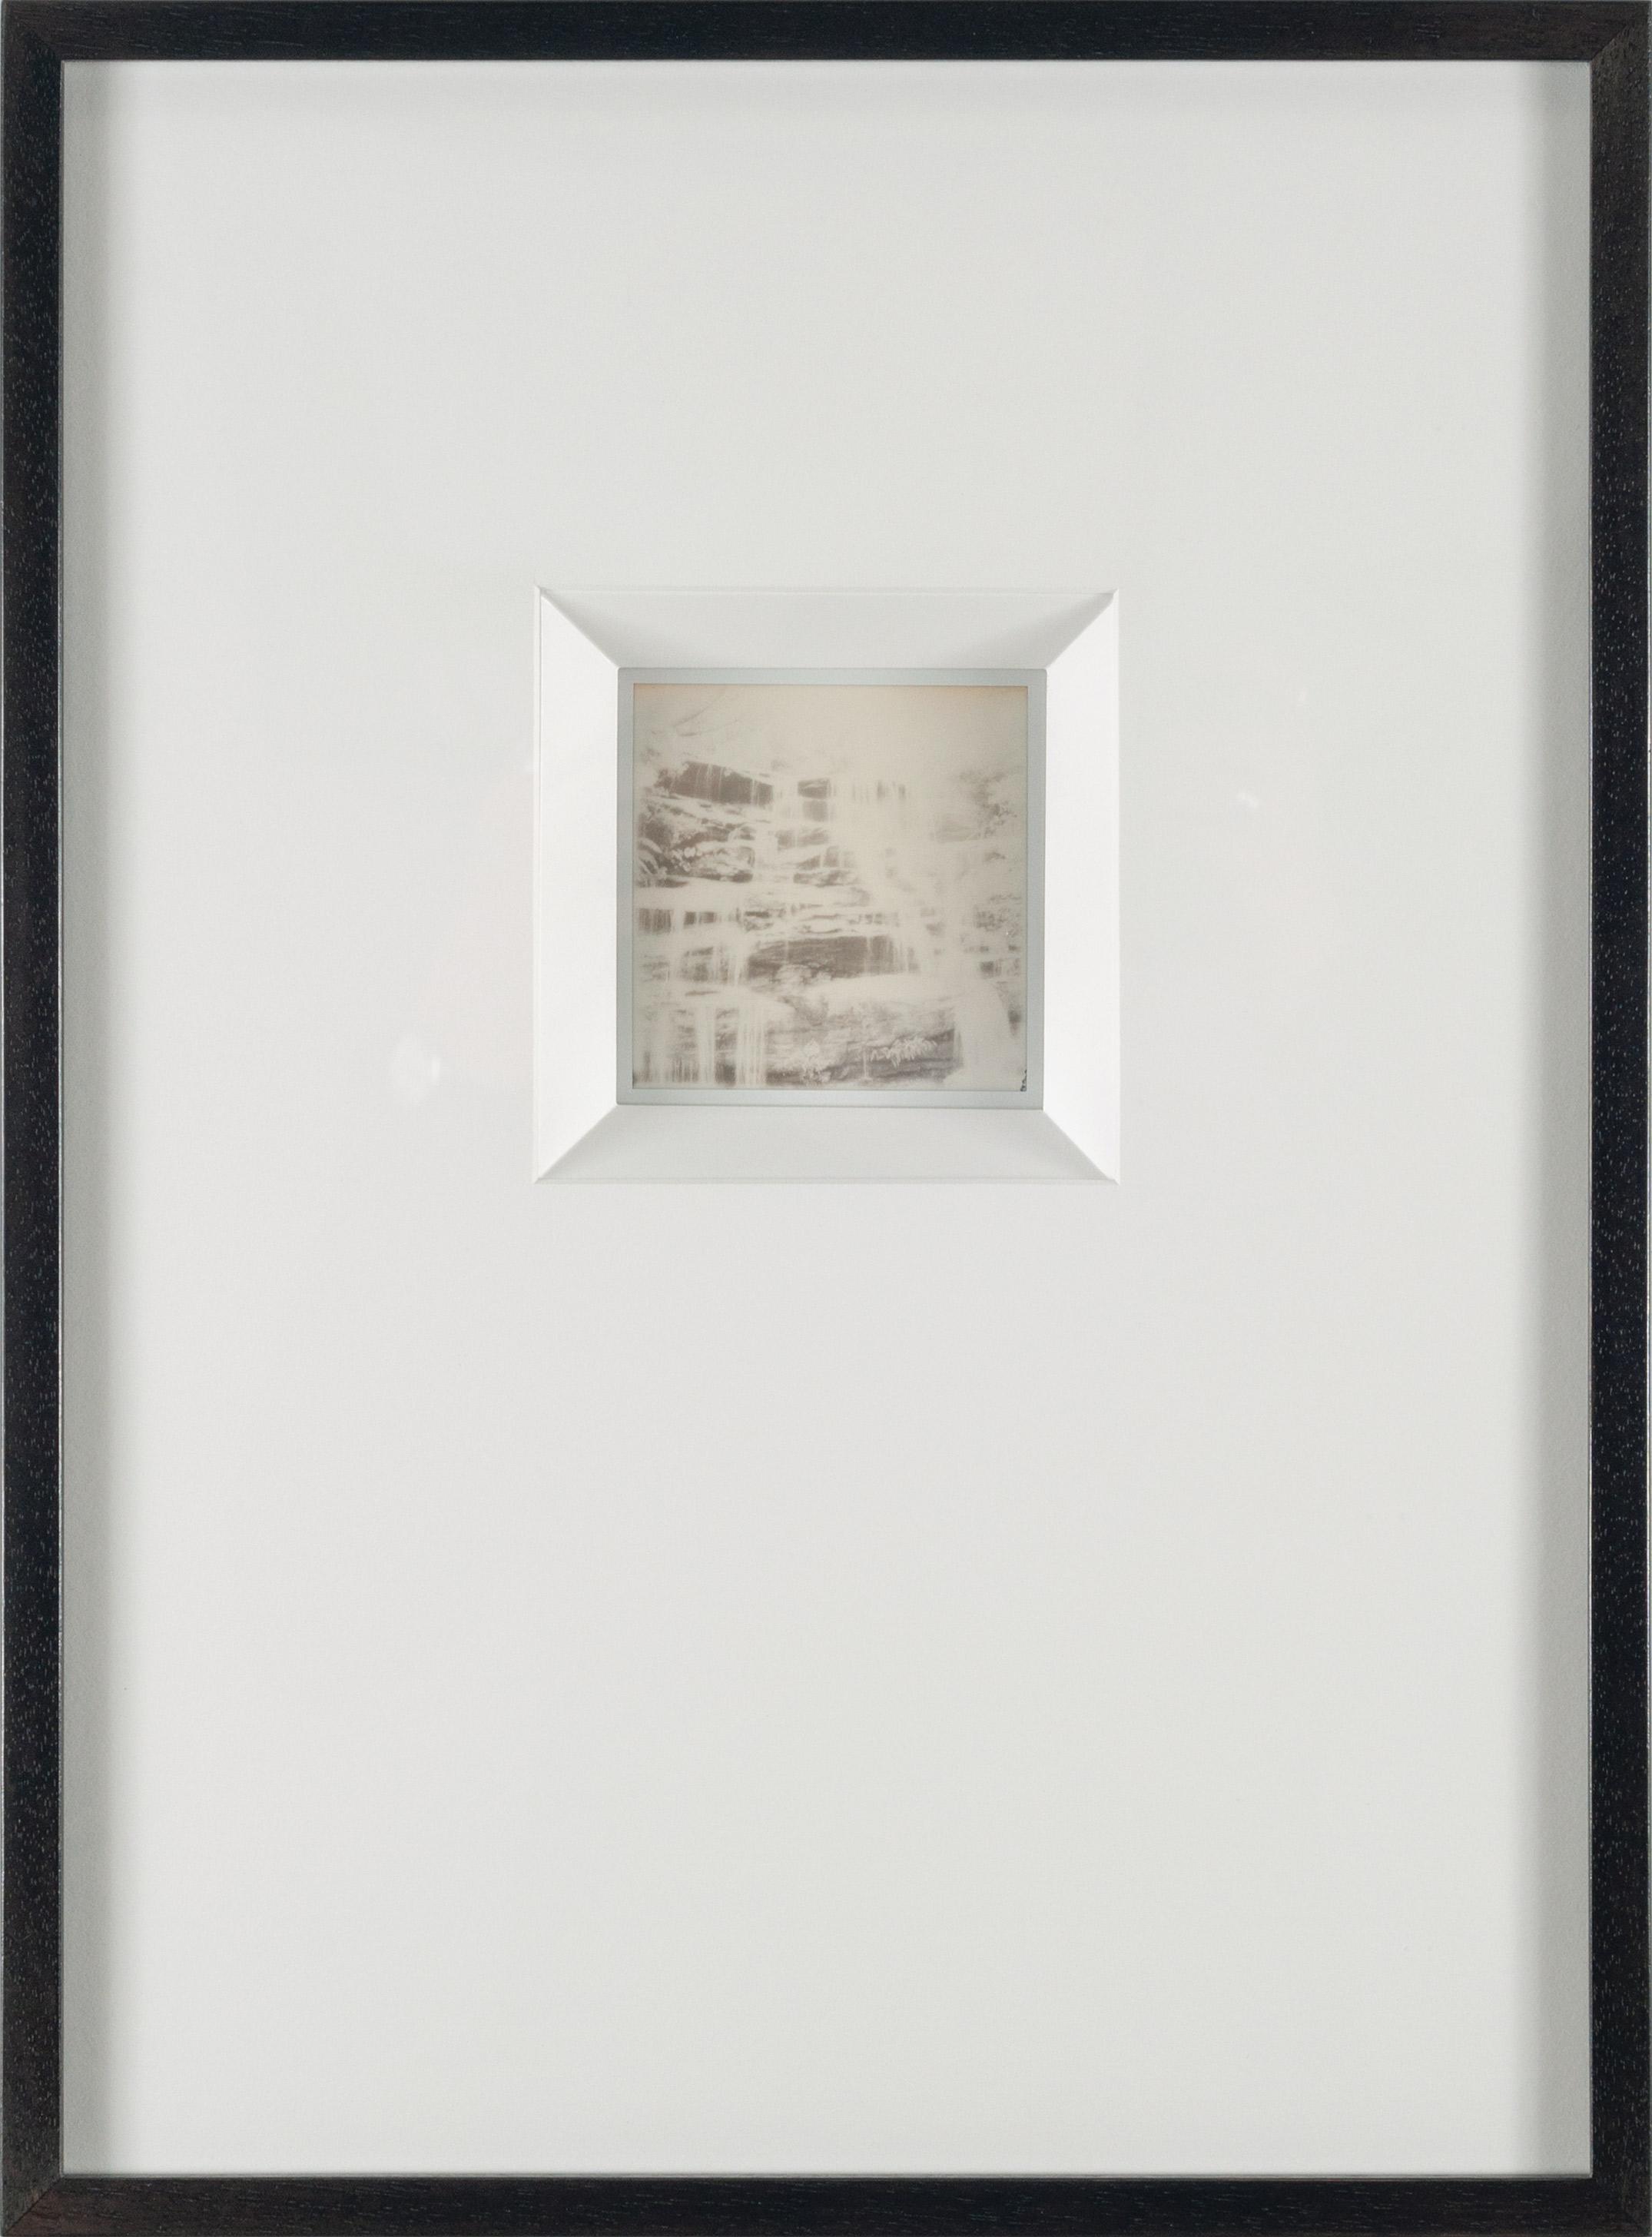 6.A.Hodgkinson - Untitled 1 - 2018 - Polaroid print - 42.5x31.5cm.jpg